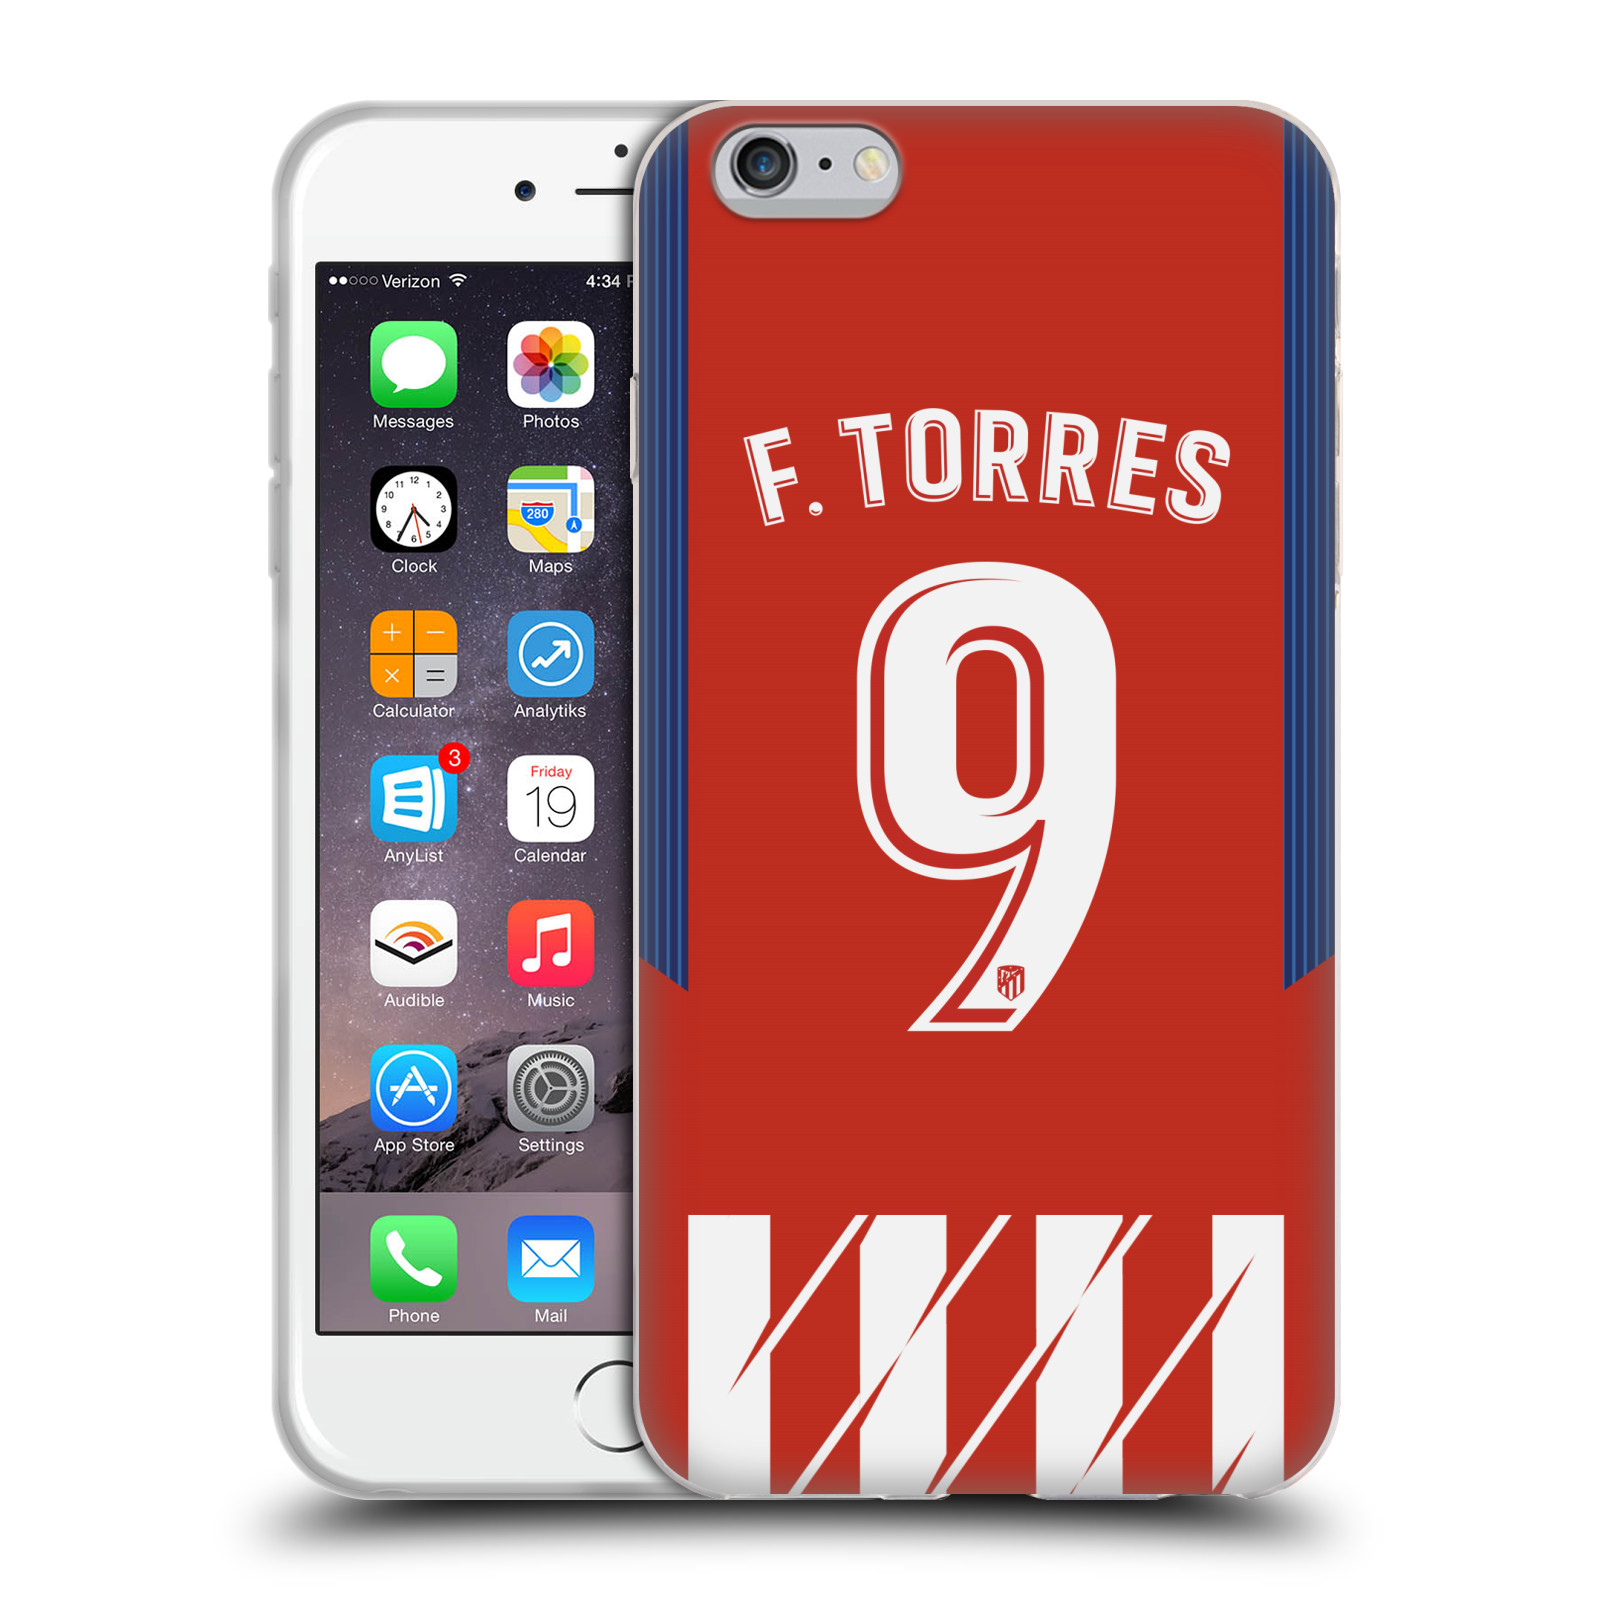 HEAD CASE silikonový obal na mobil Apple Iphone 6/6S PLUS Fotbalový klub Atlético Madrid dres Fernando Torres